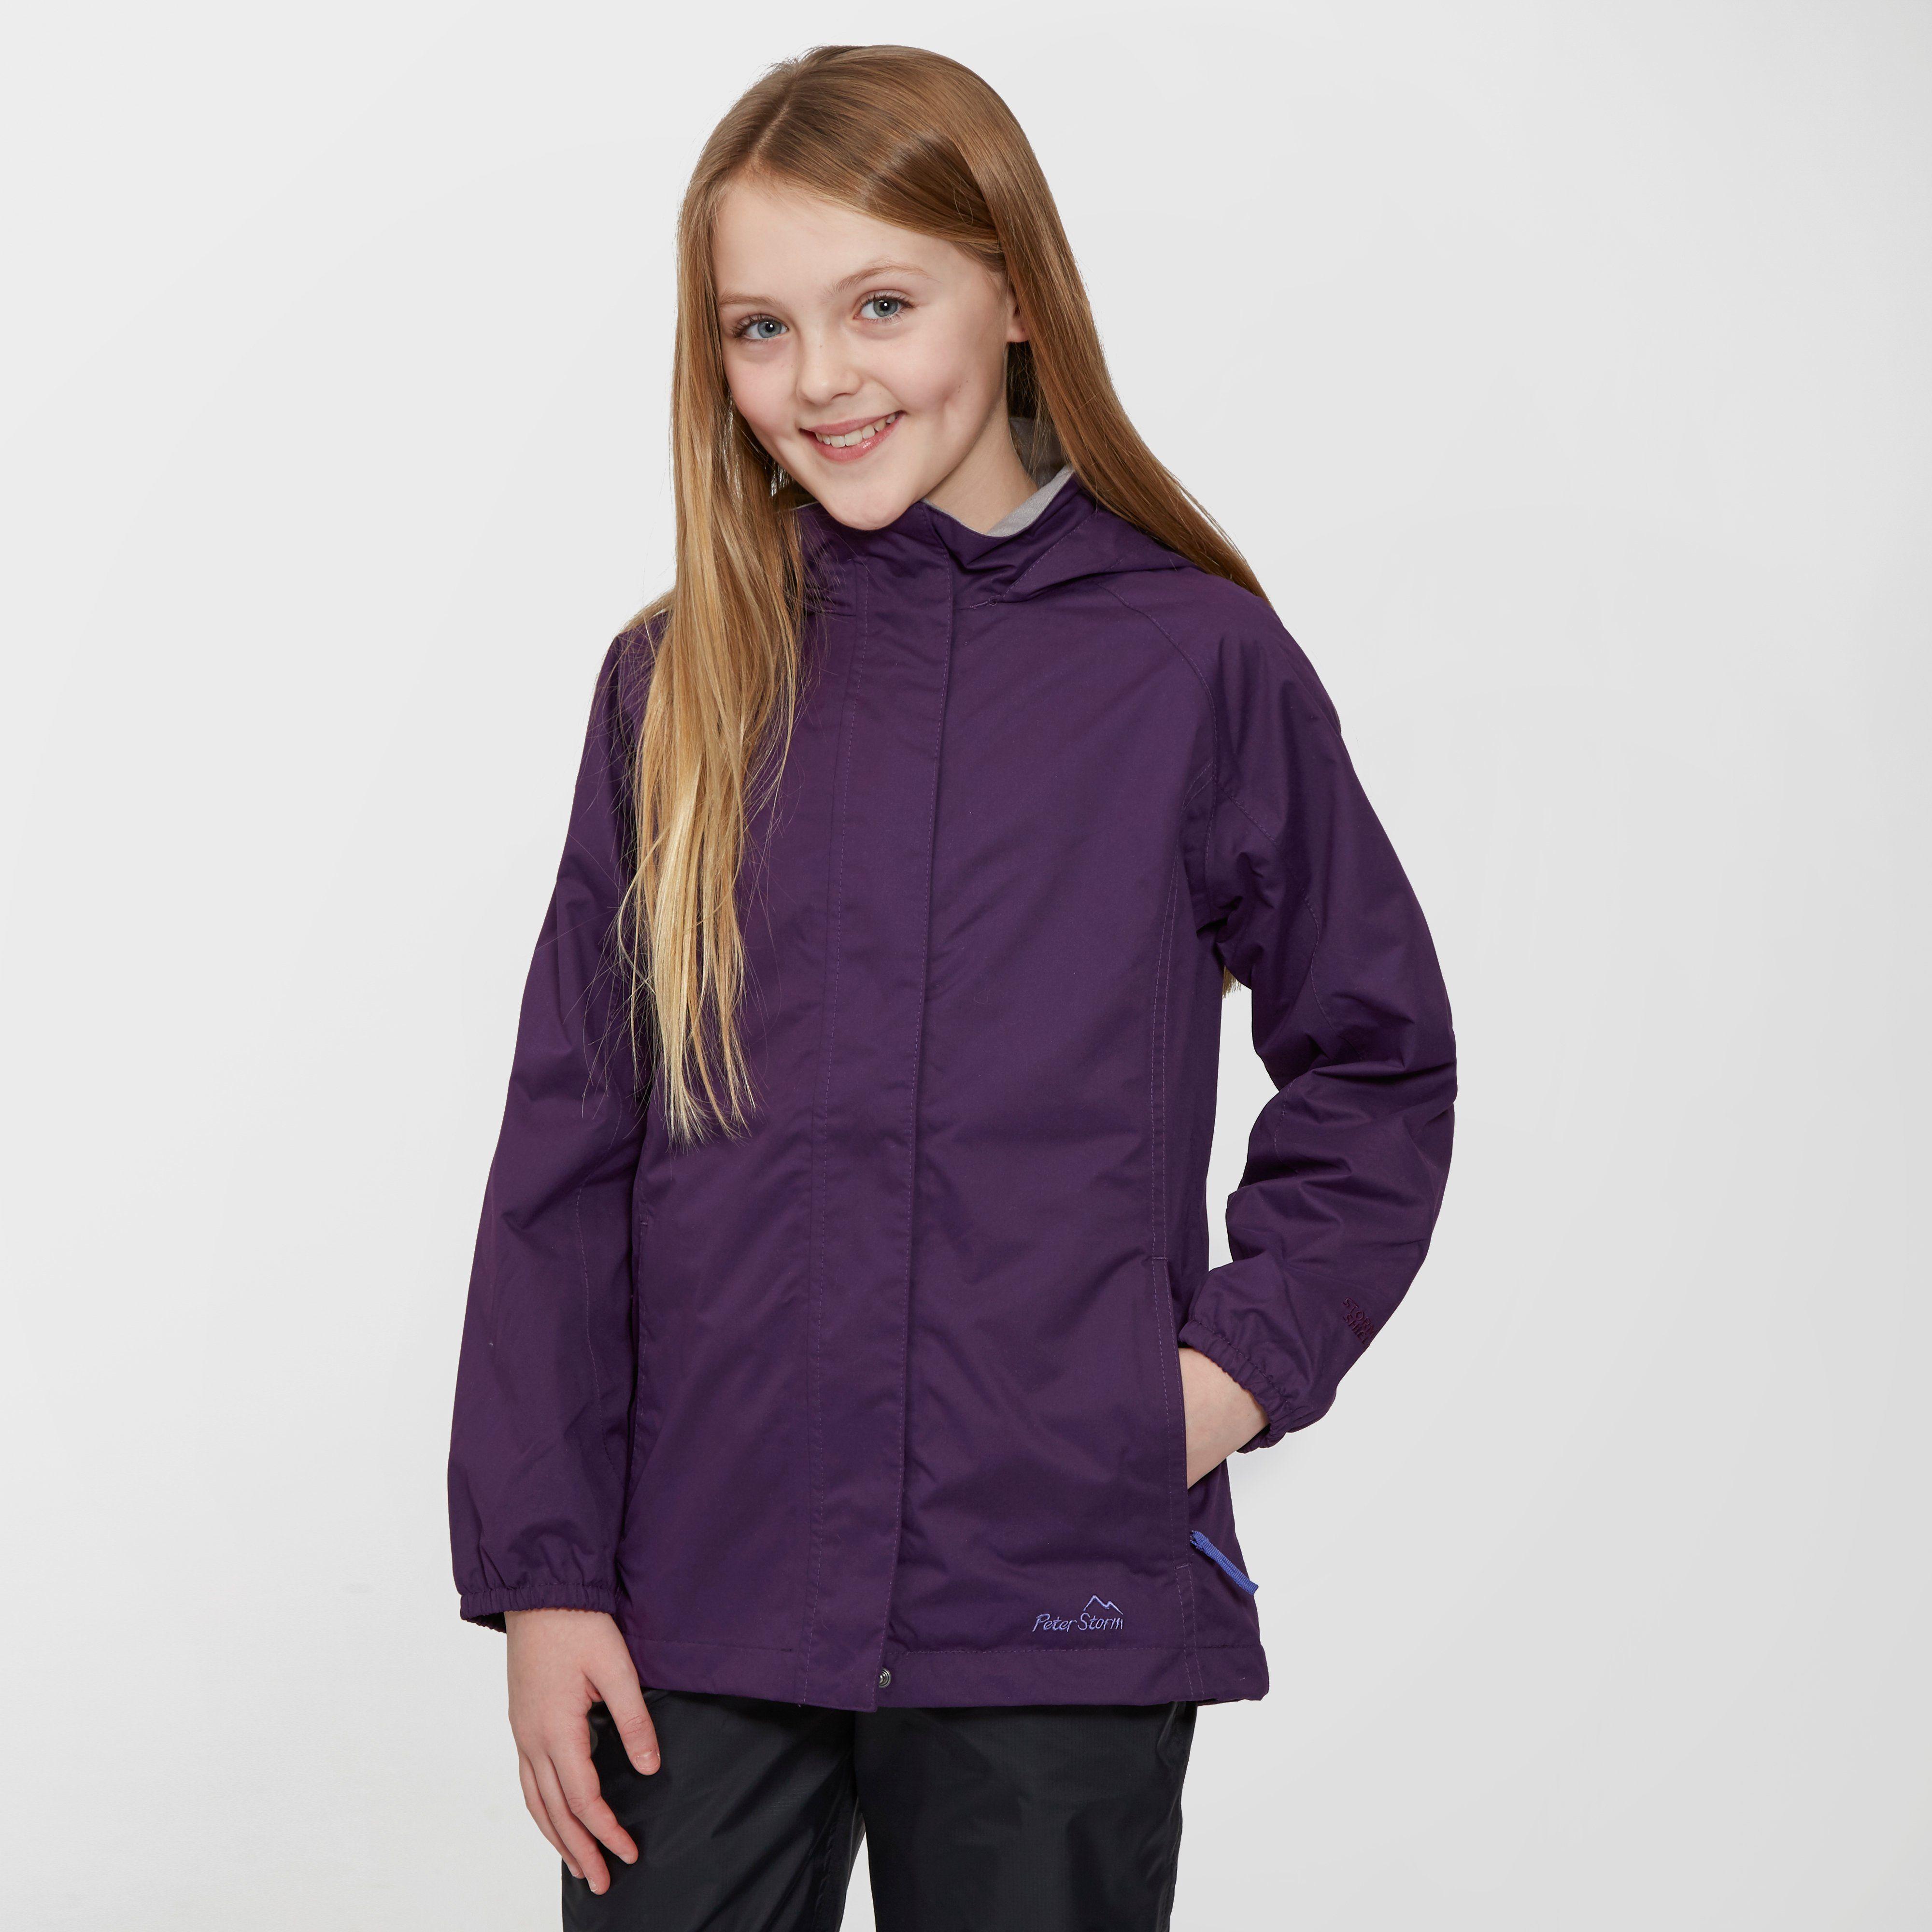 PETER STORM Girl's Wendy II Waterproof Jacket